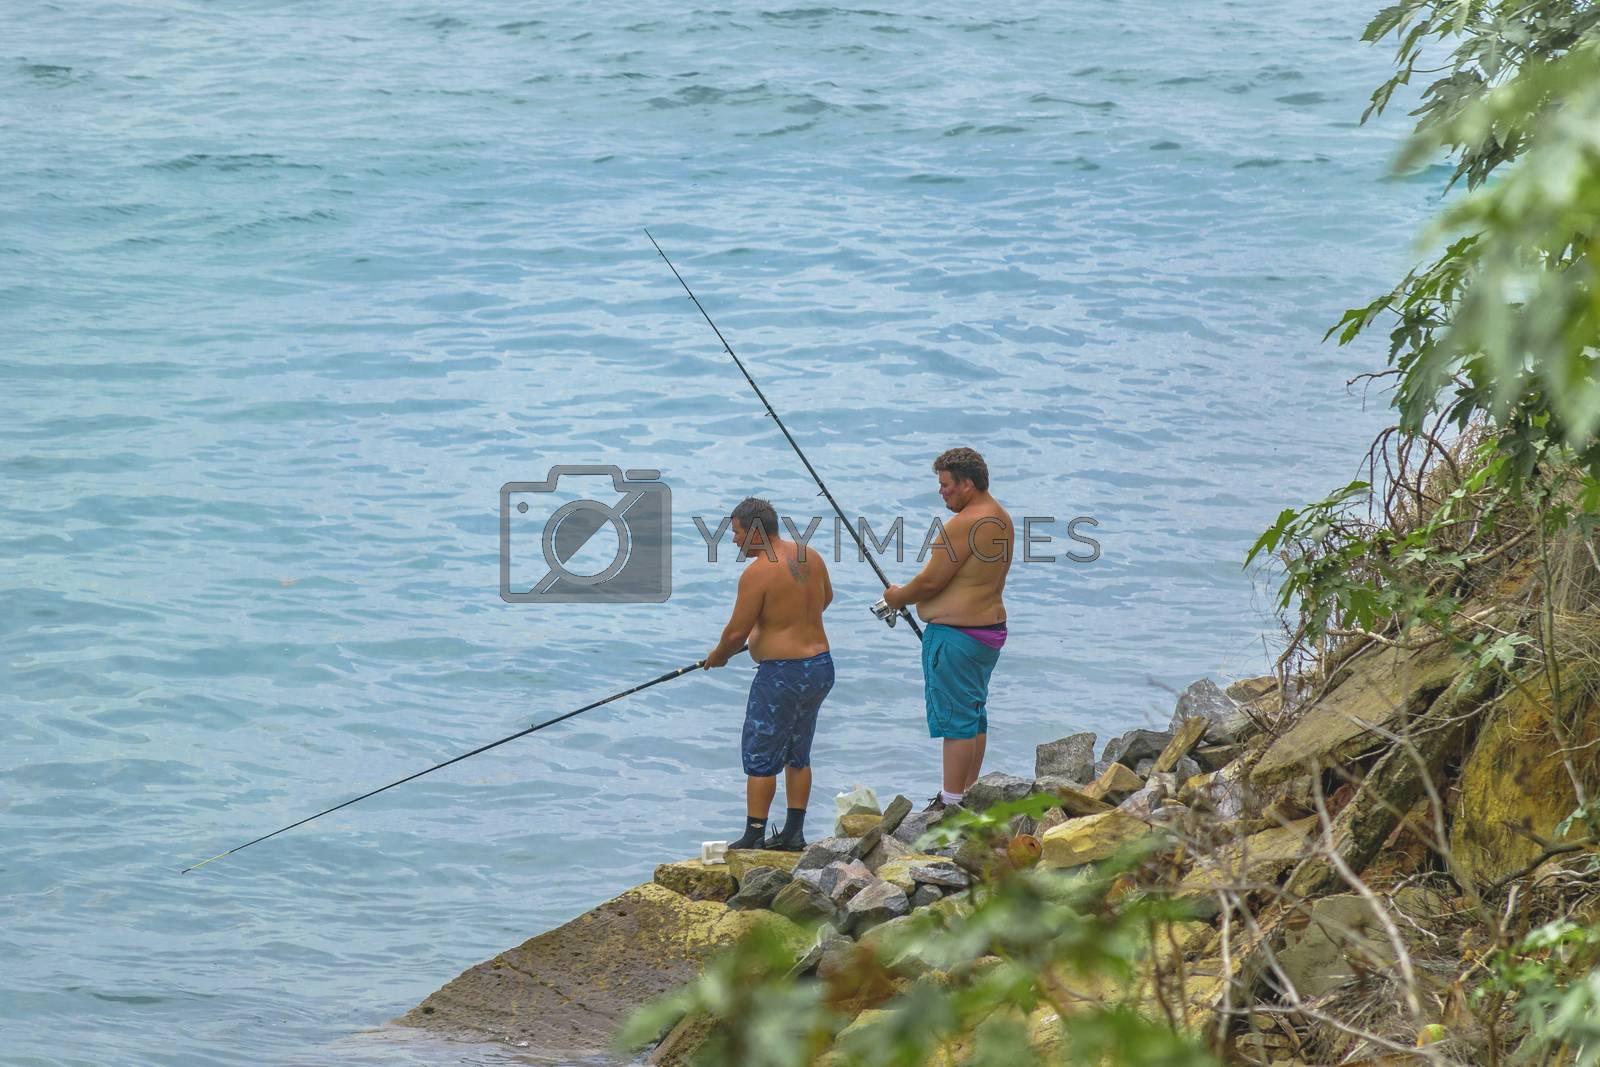 TIBAU DO SUL, BRAZIL - JANUARY - 2016 - Two adult fisherman fishing at shore of ocean in Tibau do Sul, Brazil